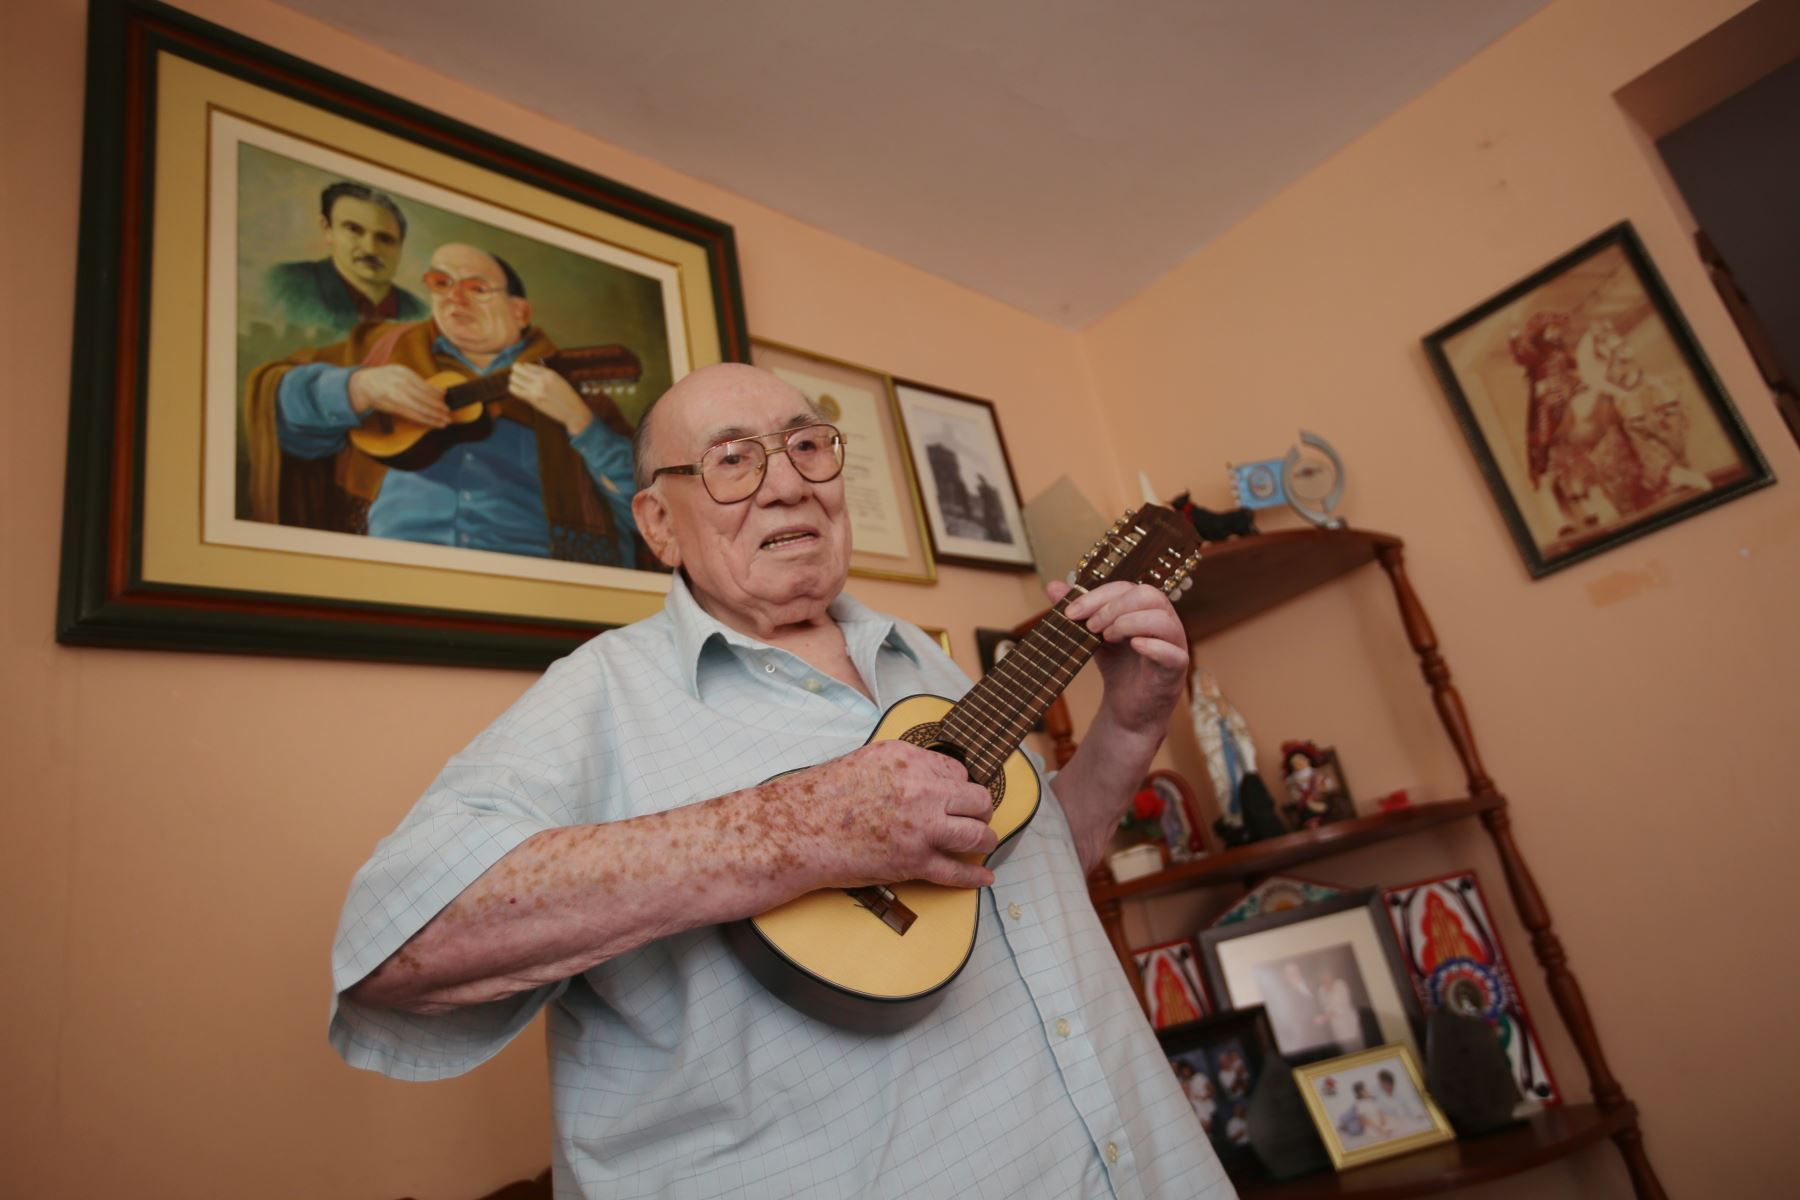 Retrato del charanguista Jaime Guardia. Foto: Difusión